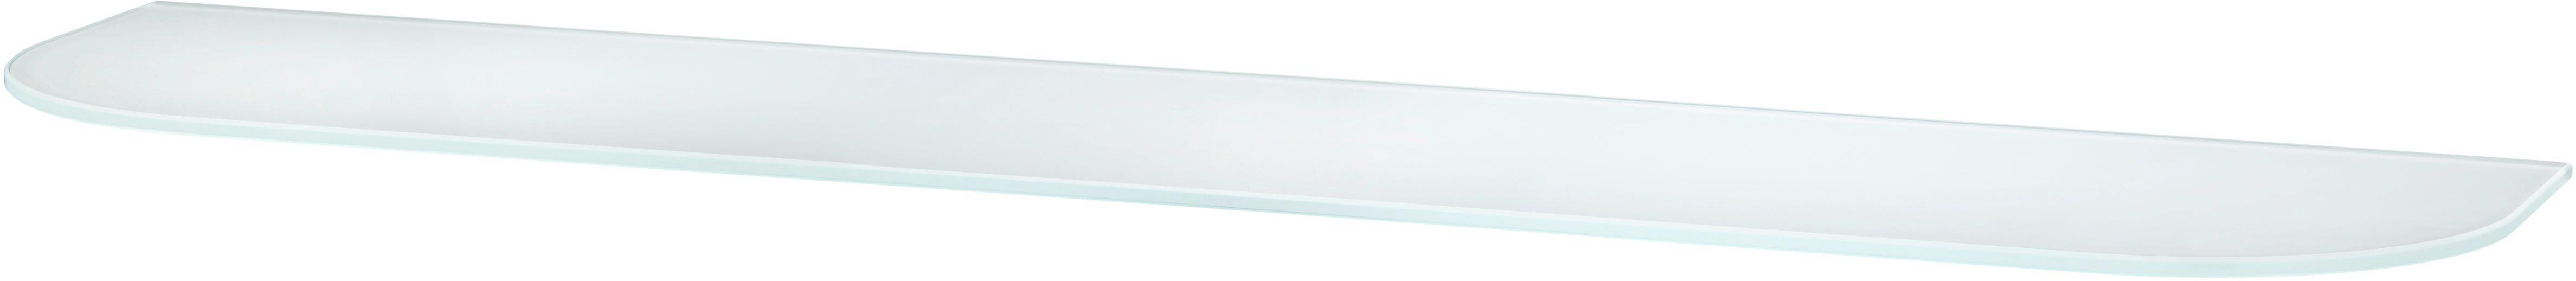 Falipolc Glas - opál, üveg (78/0,6/18cm)